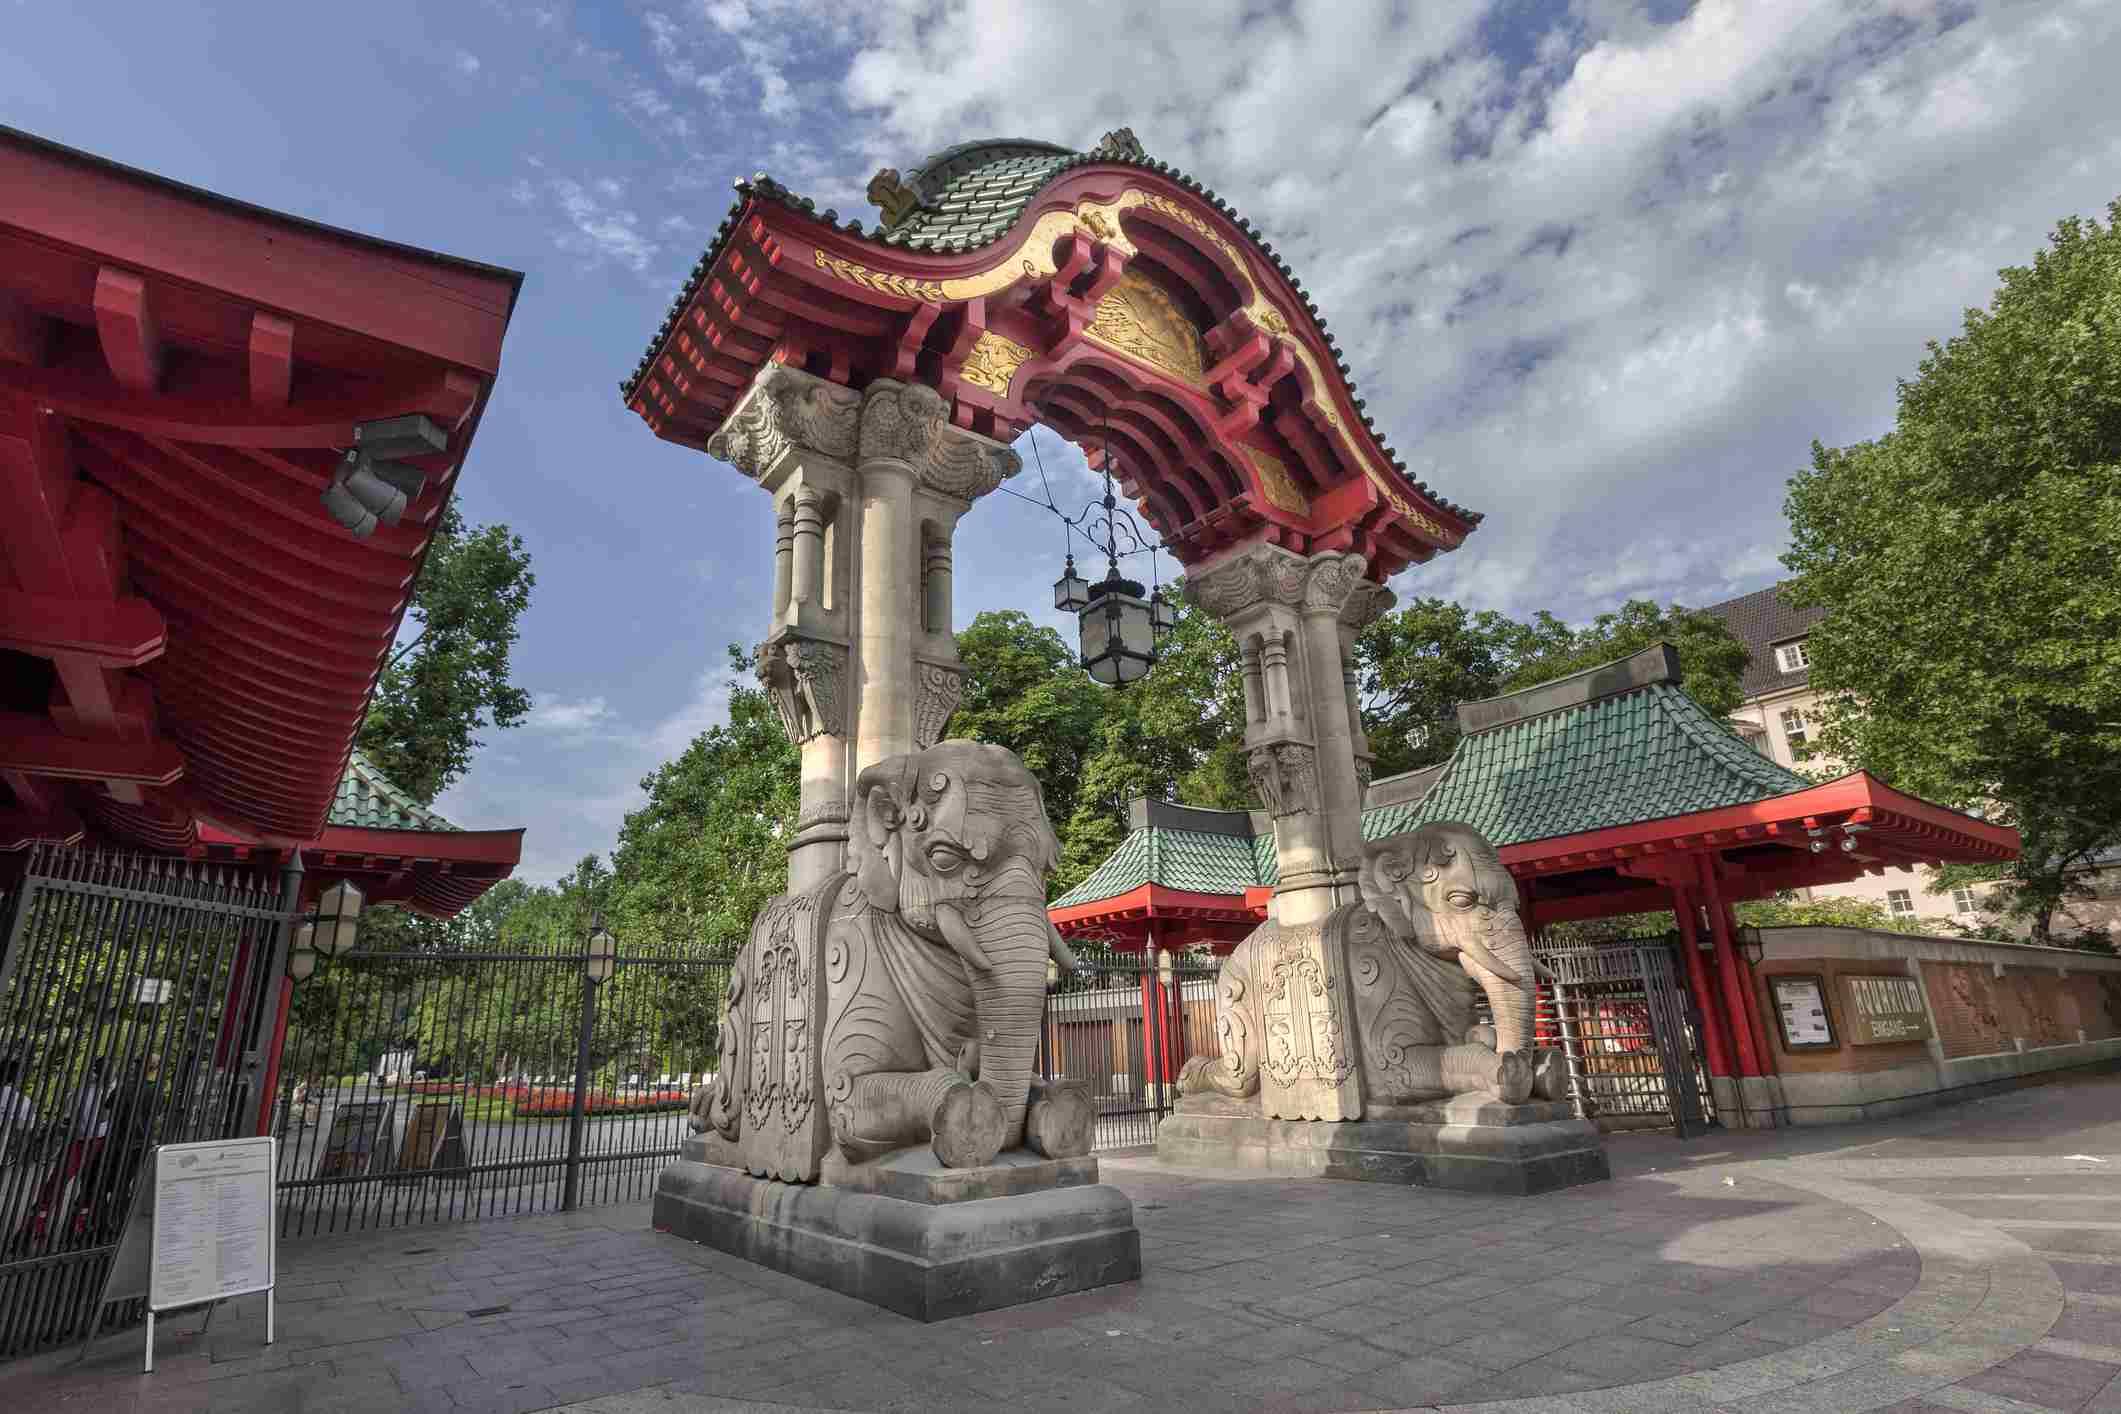 Elephant gate entrance to Zoological Gardens